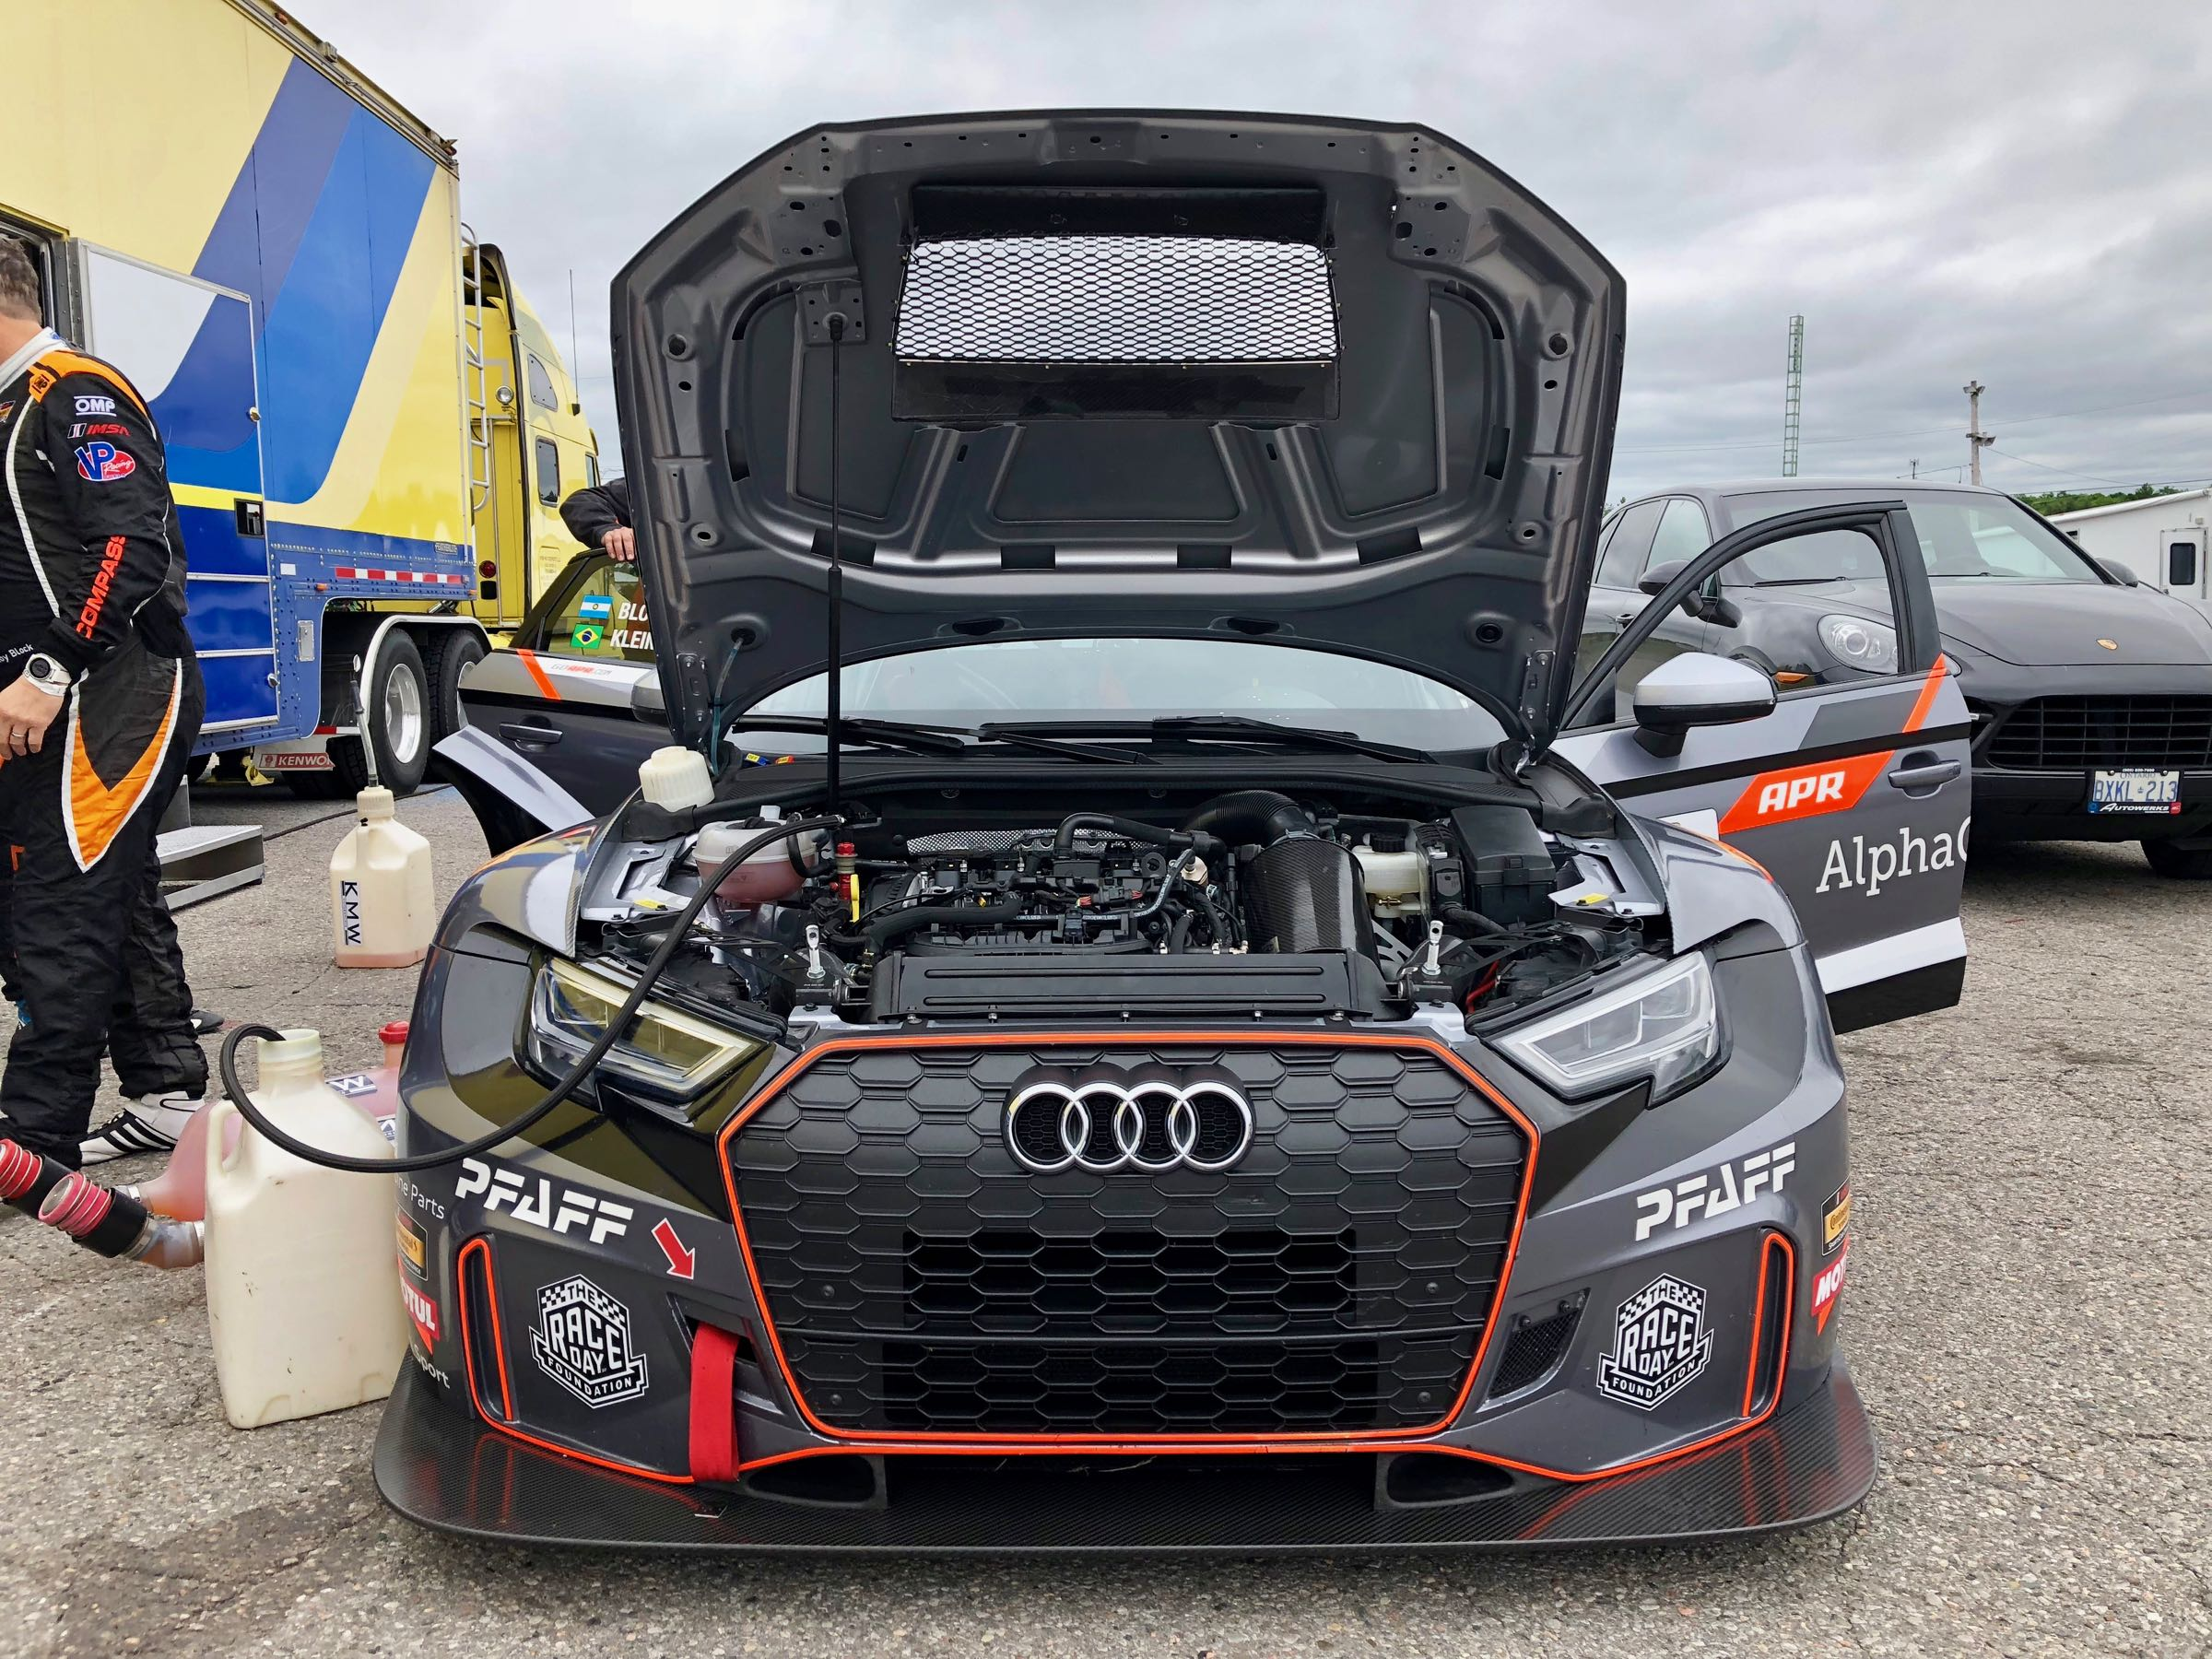 Road Car Vs Racecar 2018 Audi Rs 3 Vs Audi Rs 3 Lms Tcr Wheels Ca